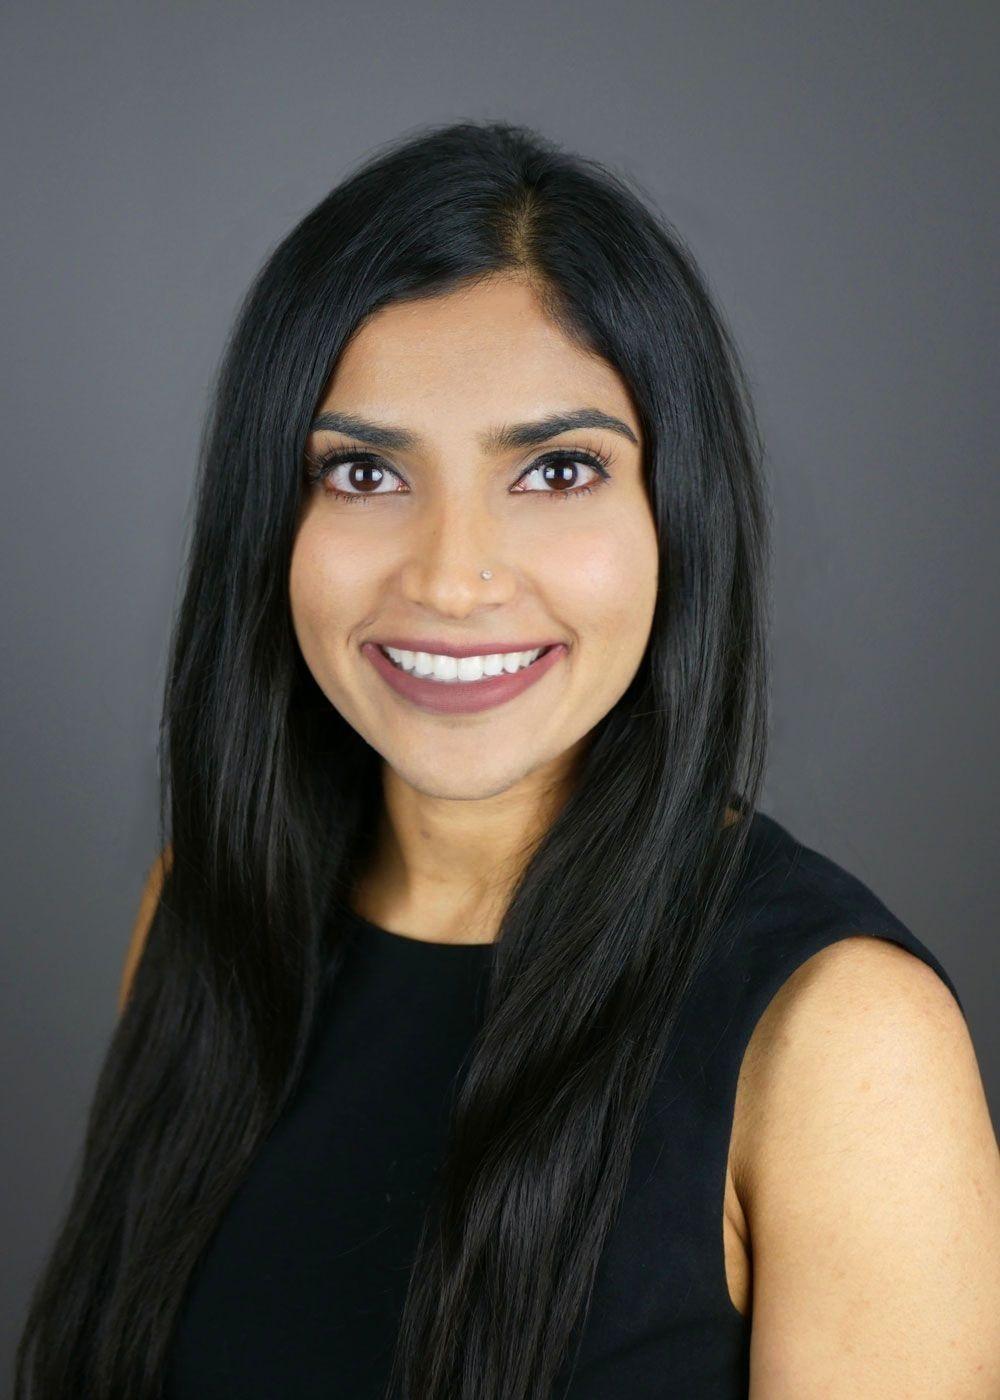 portrait of Dr. Vidhee Shah